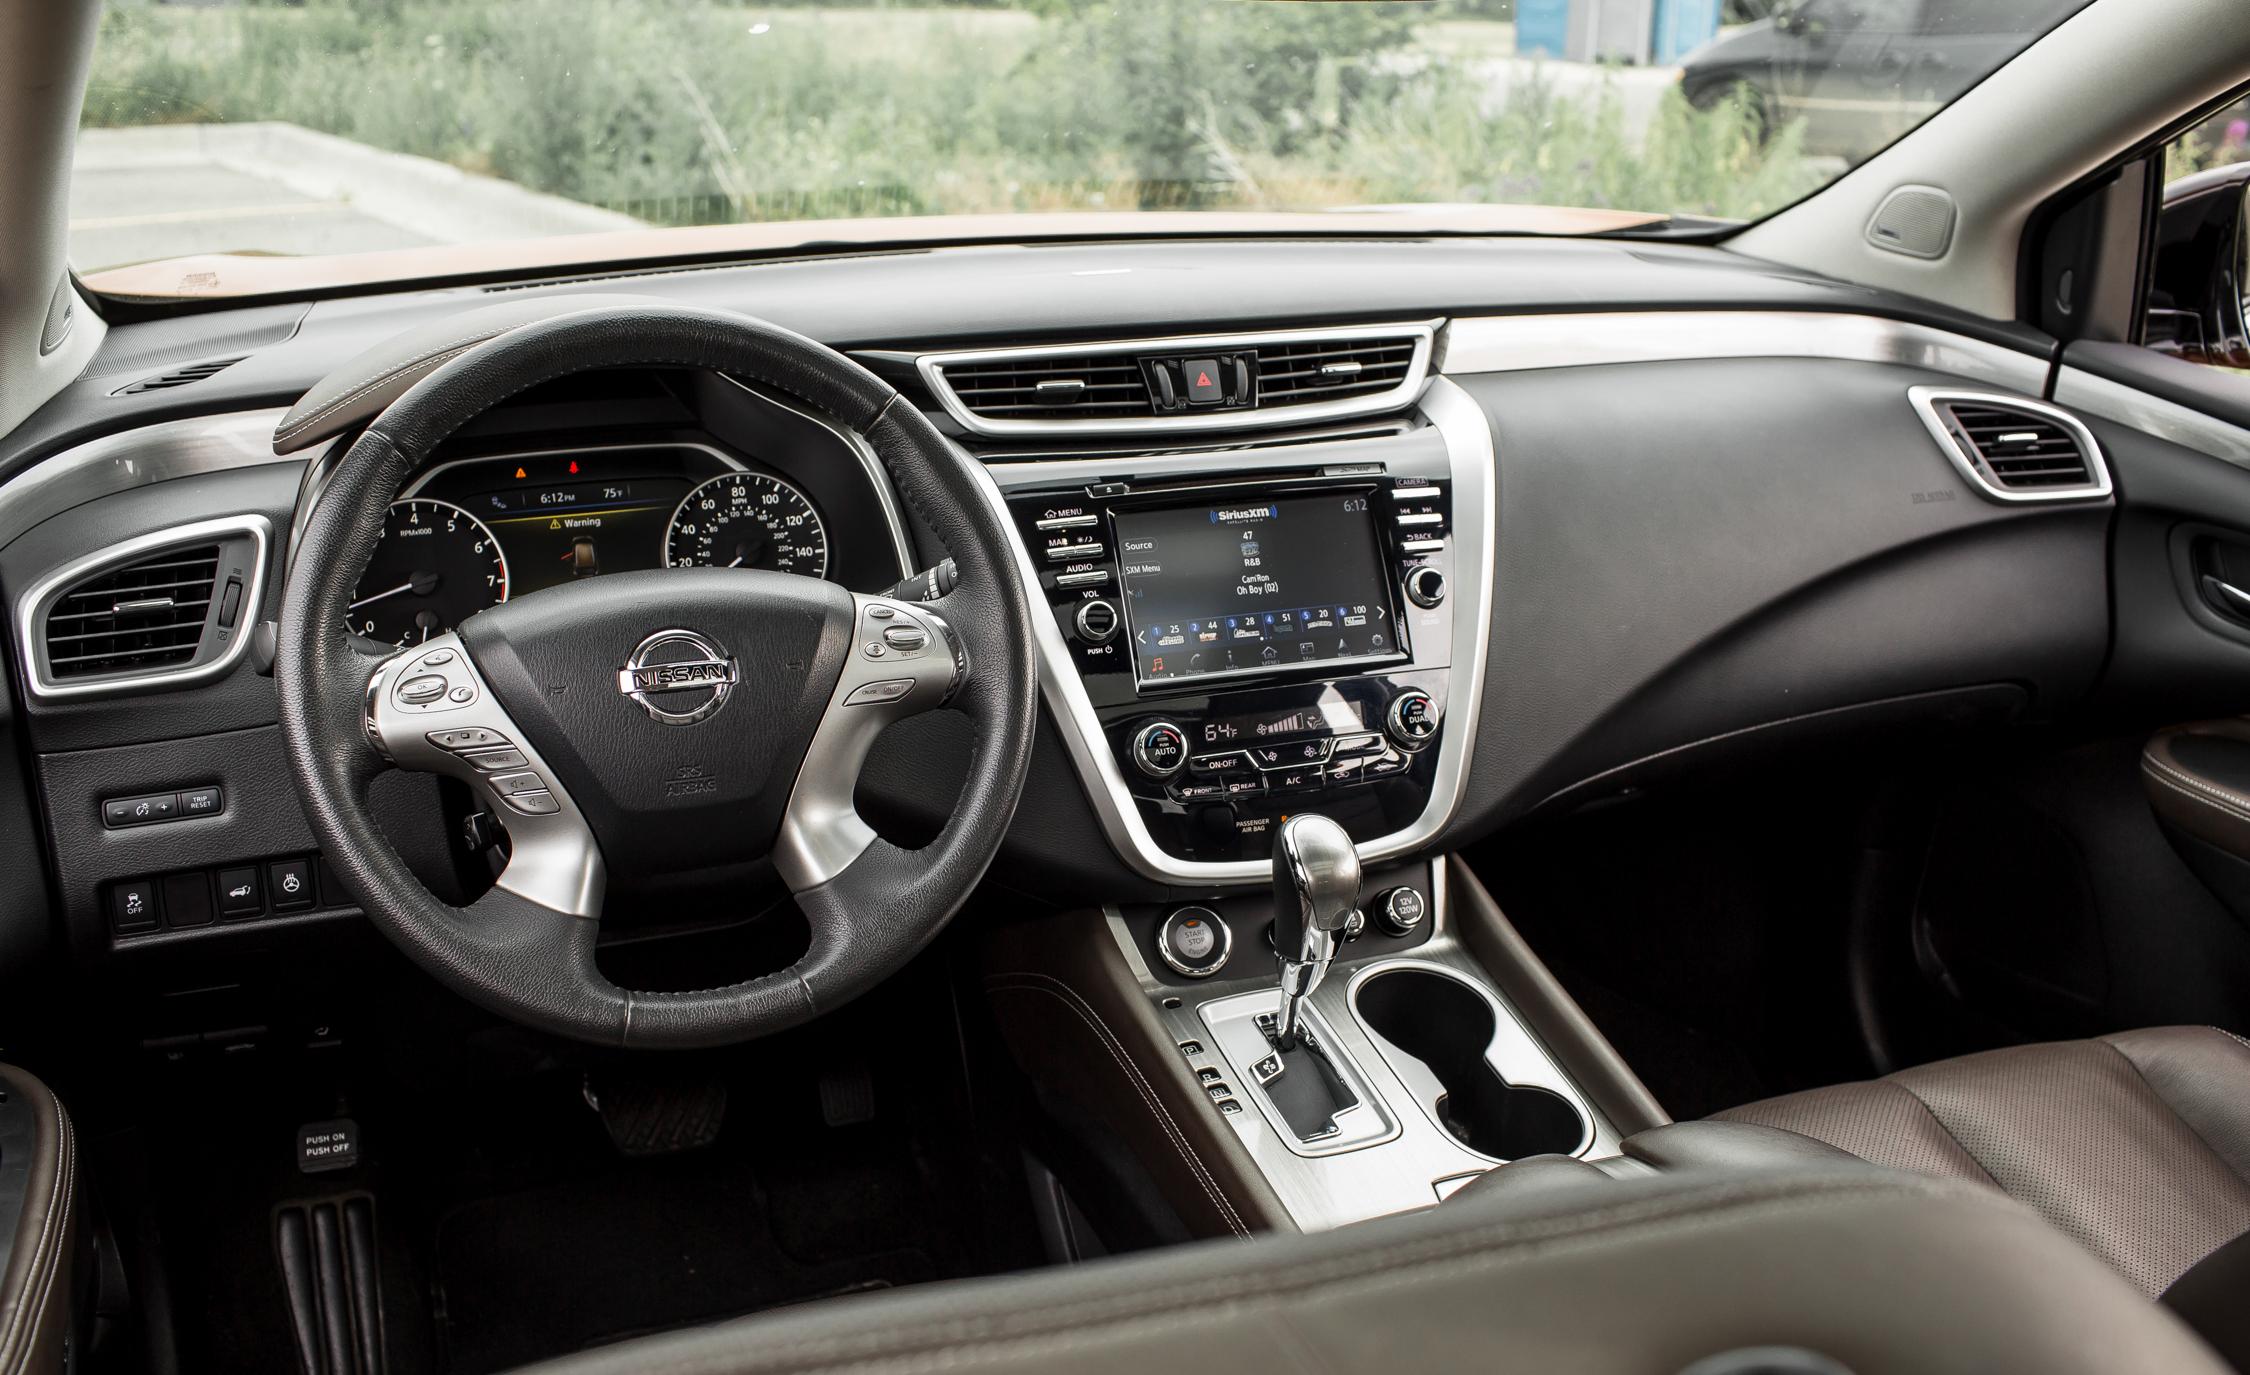 2015 Nissan Murano Platinum CVT AWD (Photo 24 of 27)